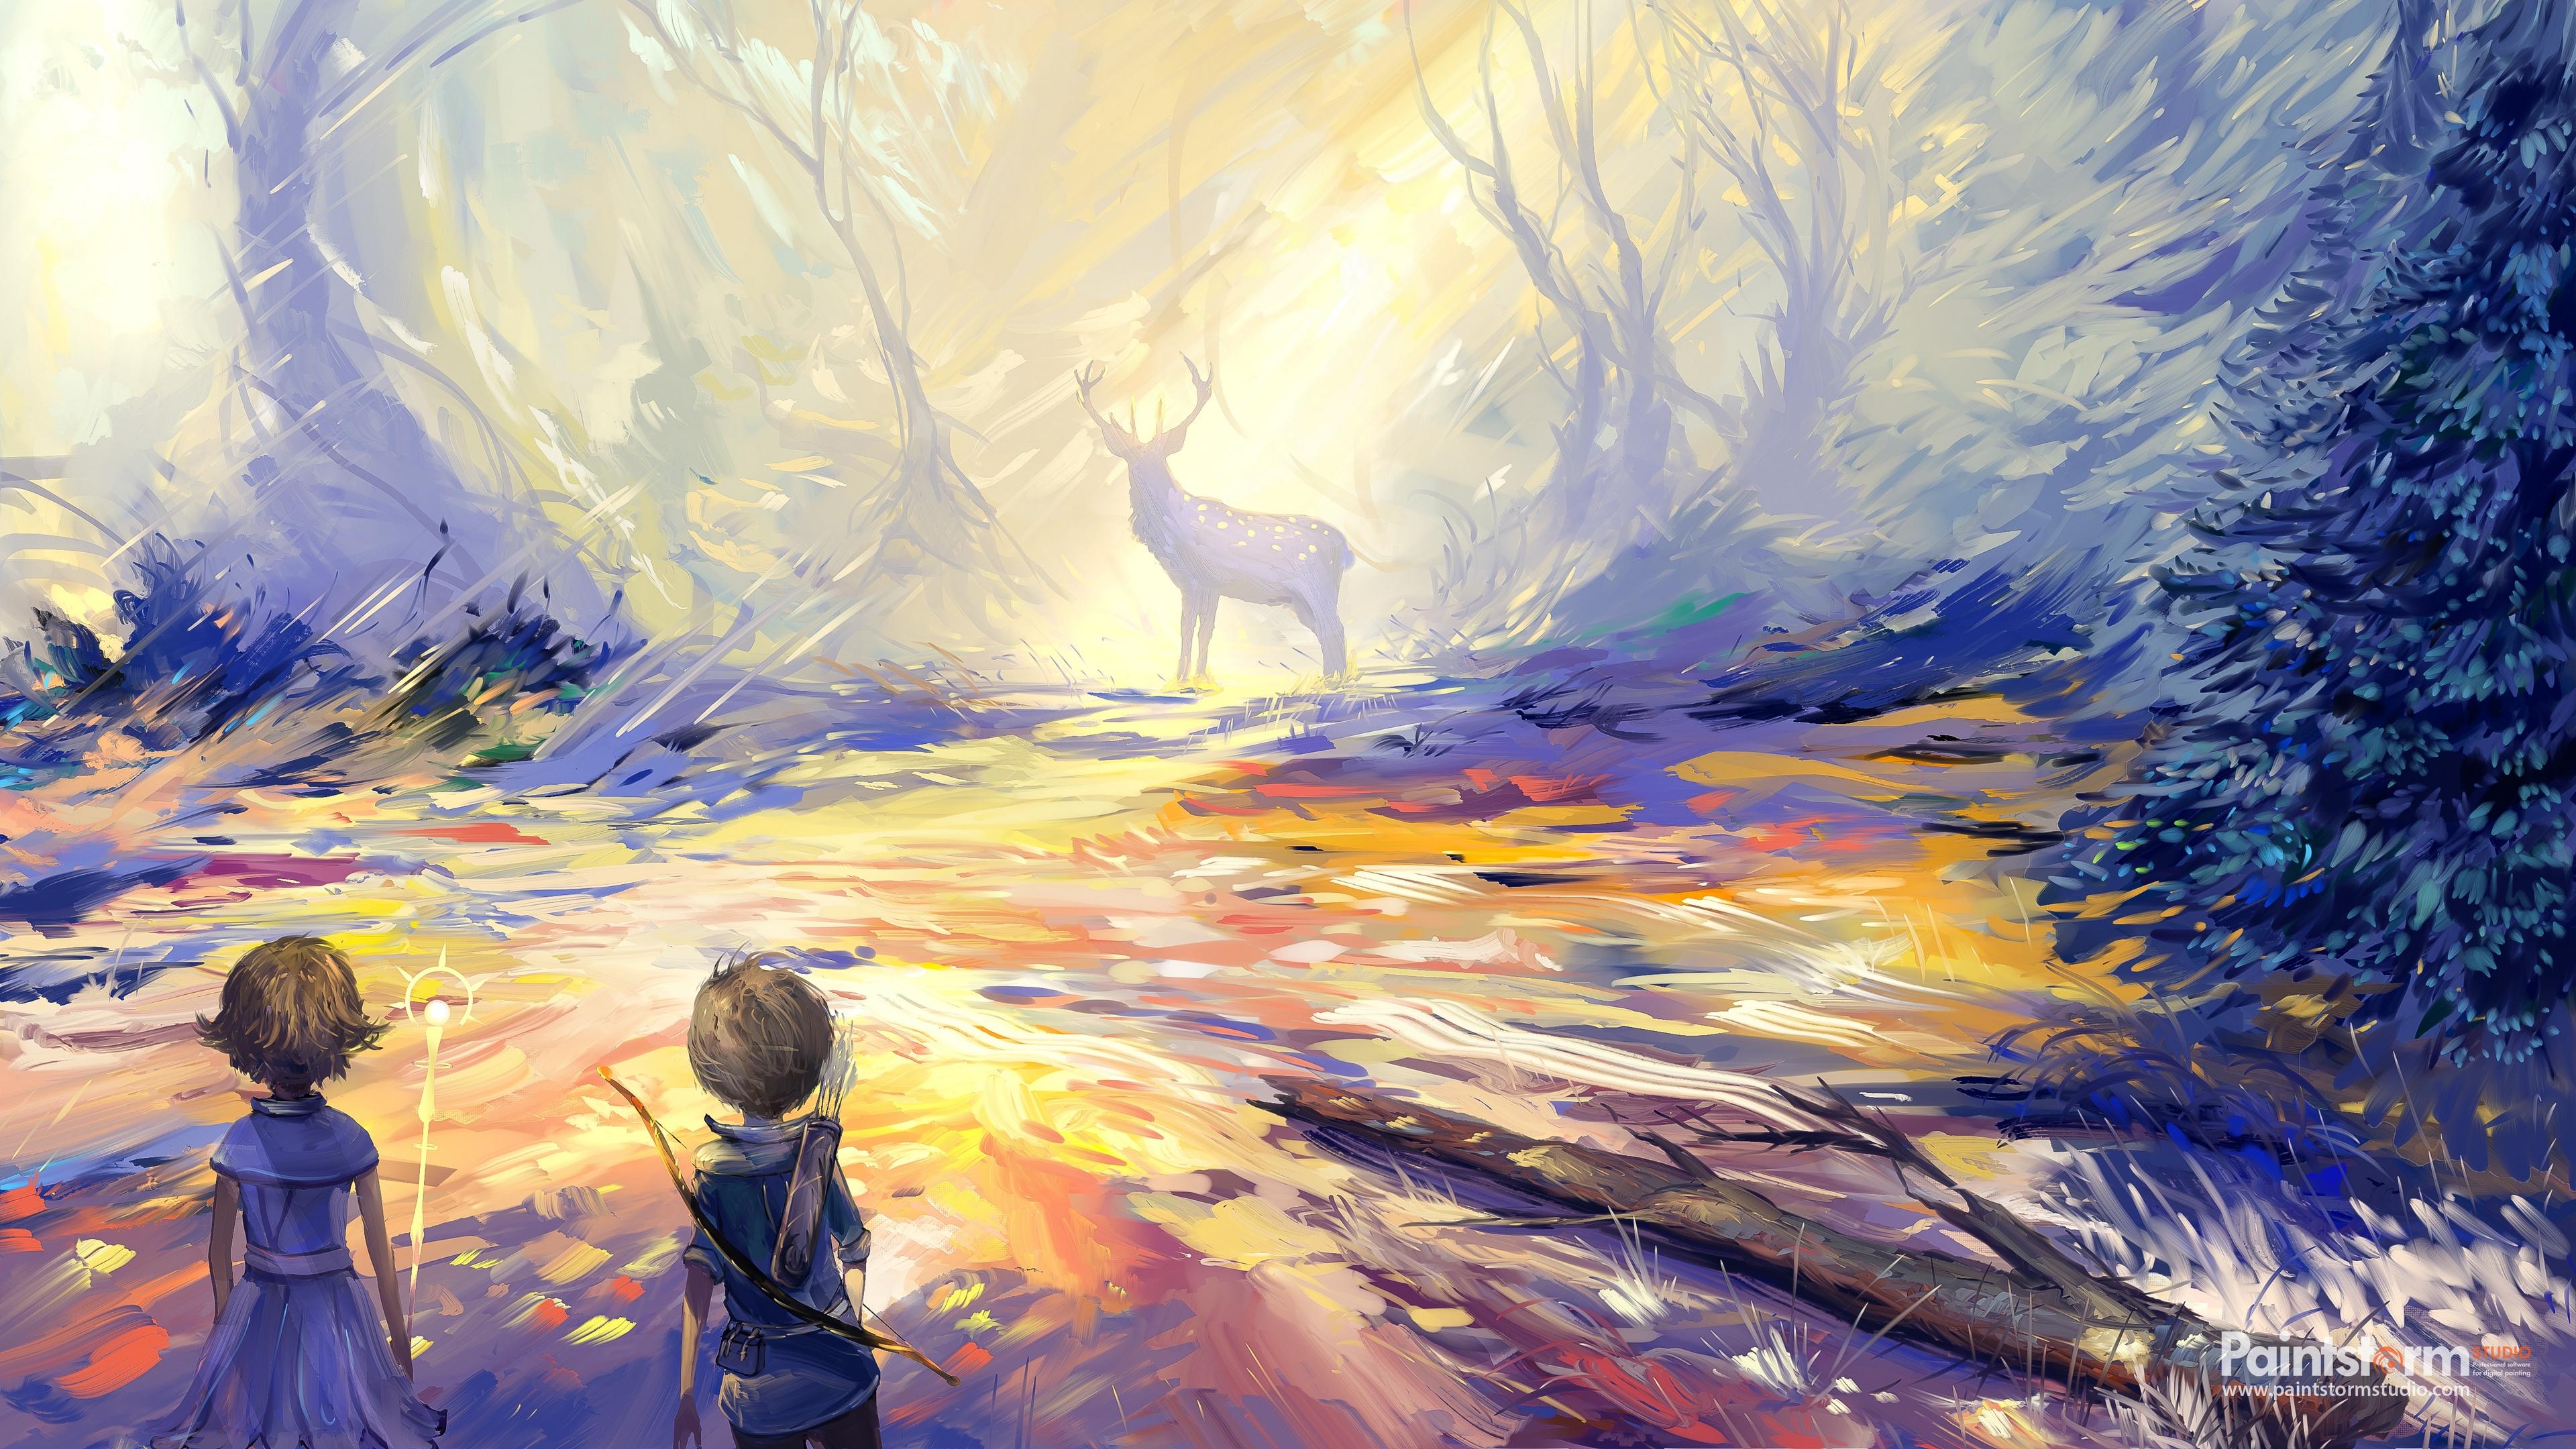 child deer art hunting 4k 1541971488 - child, deer, art, hunting 4k - Deer, child, art